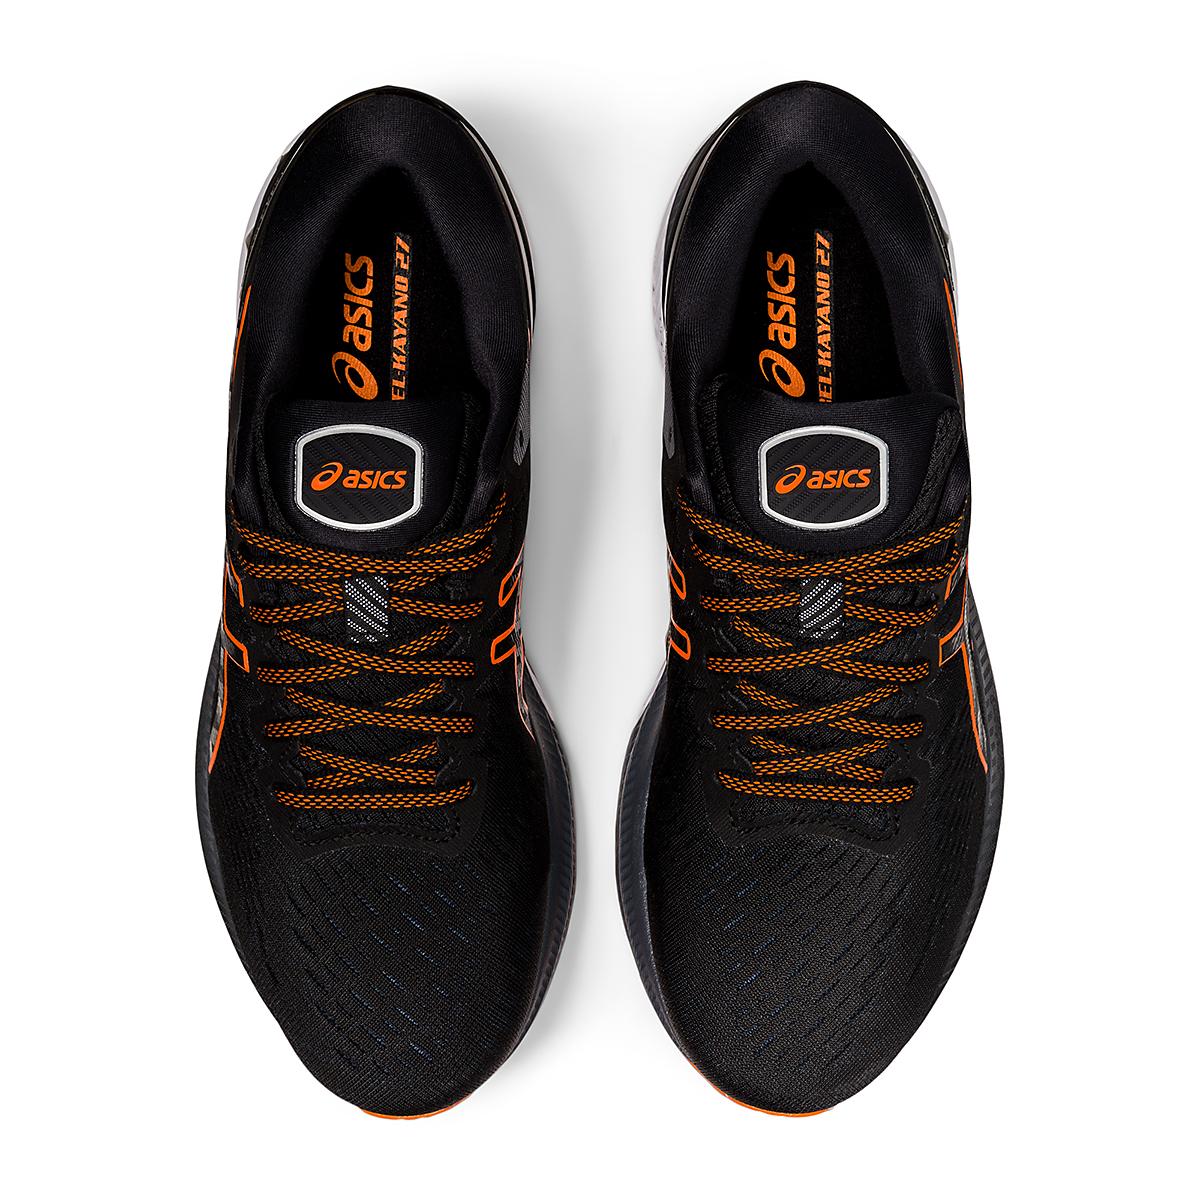 Men's Asics GEL-Kayano 27 Running Shoe - Color: Black/Marigold - Size: 7.5 - Width: Regular, Black/Marigold, large, image 5